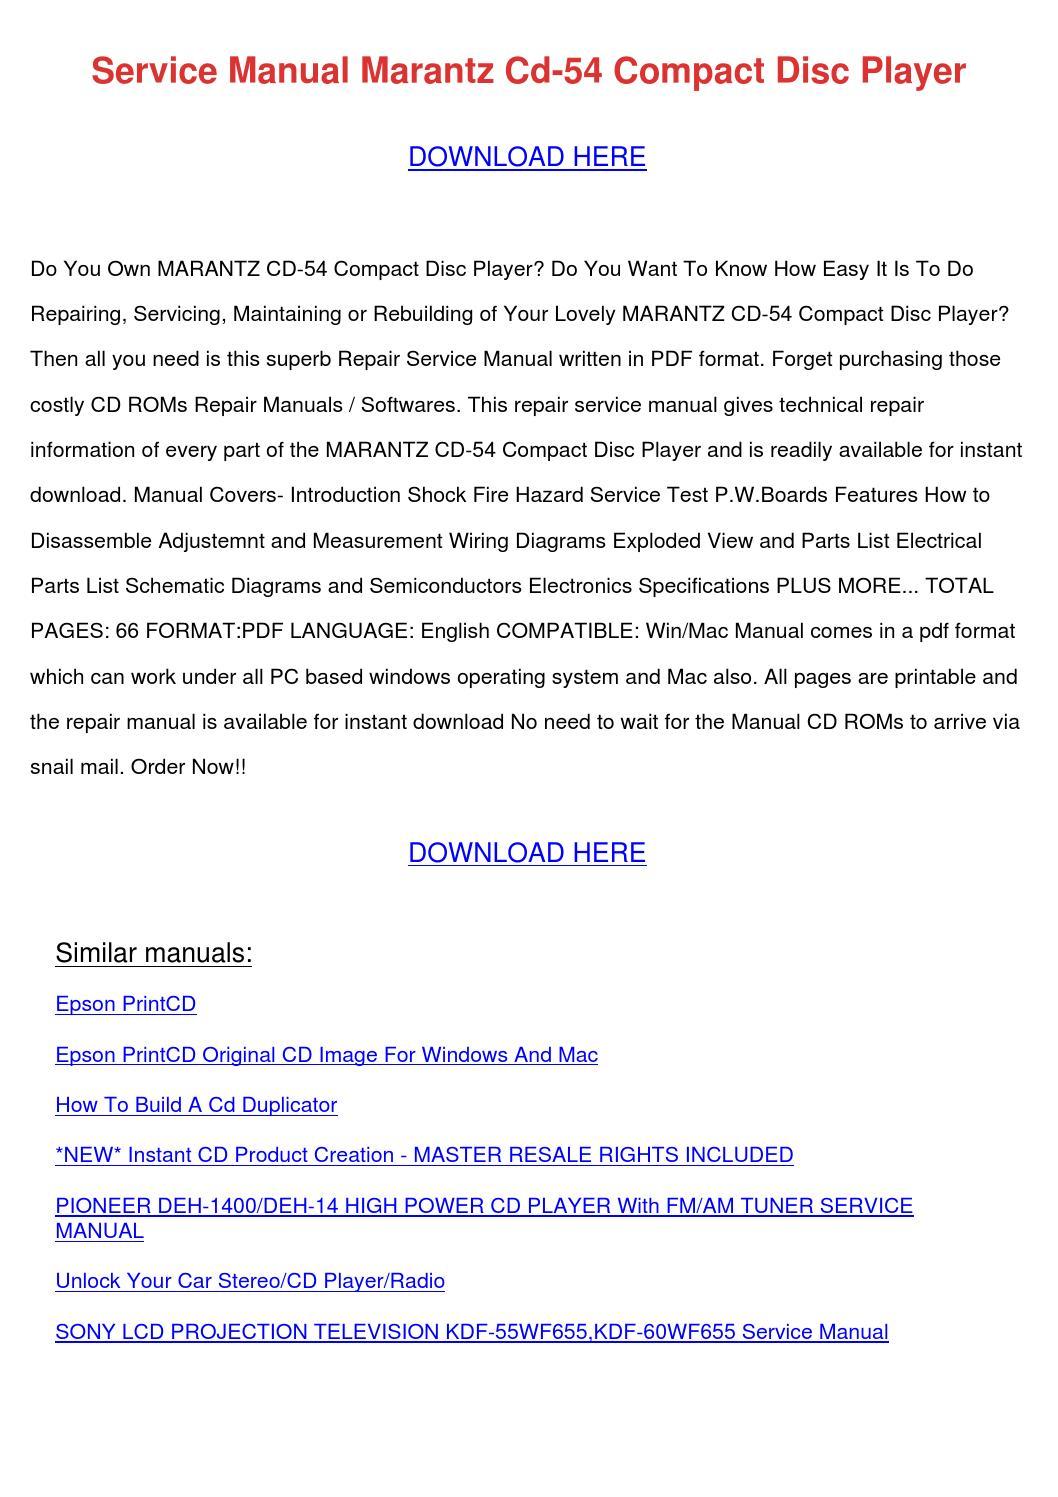 Service Manual Marantz Cd 54 Compact Disc Pla by RodneyRaymond - issuu